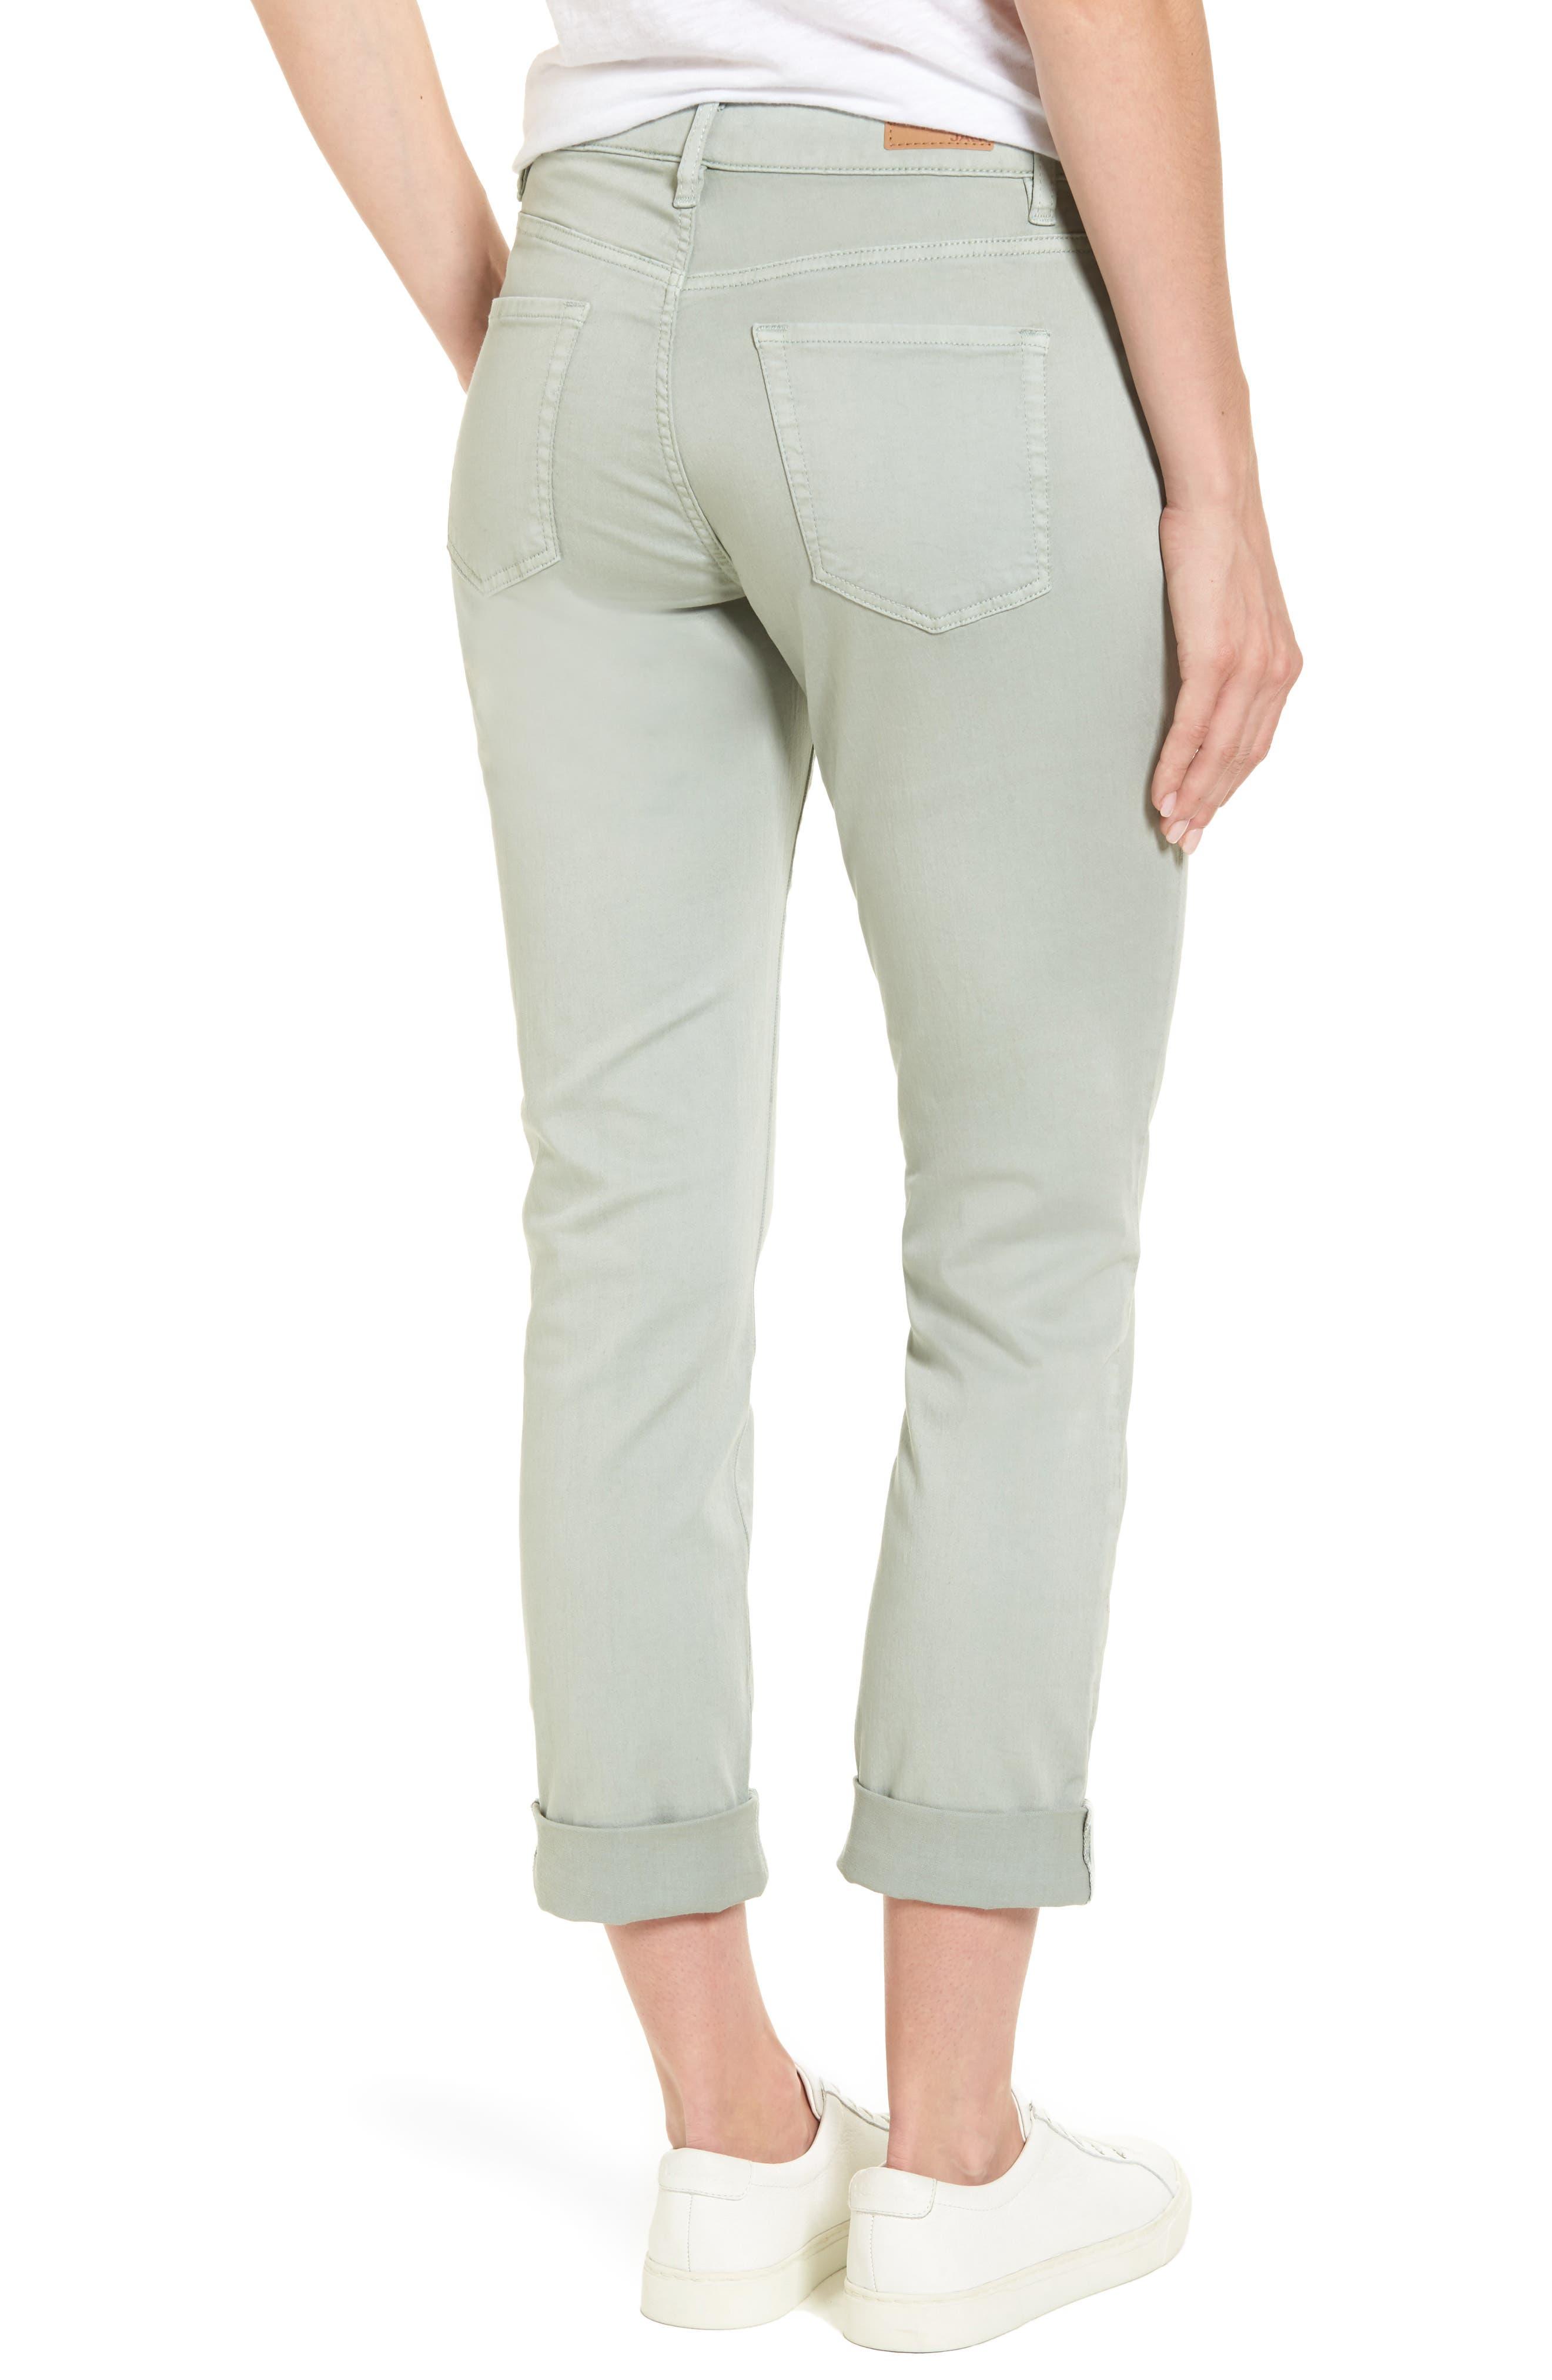 Carter Knit Denim Girlfriend Jeans,                             Alternate thumbnail 2, color,                             Beach Glass